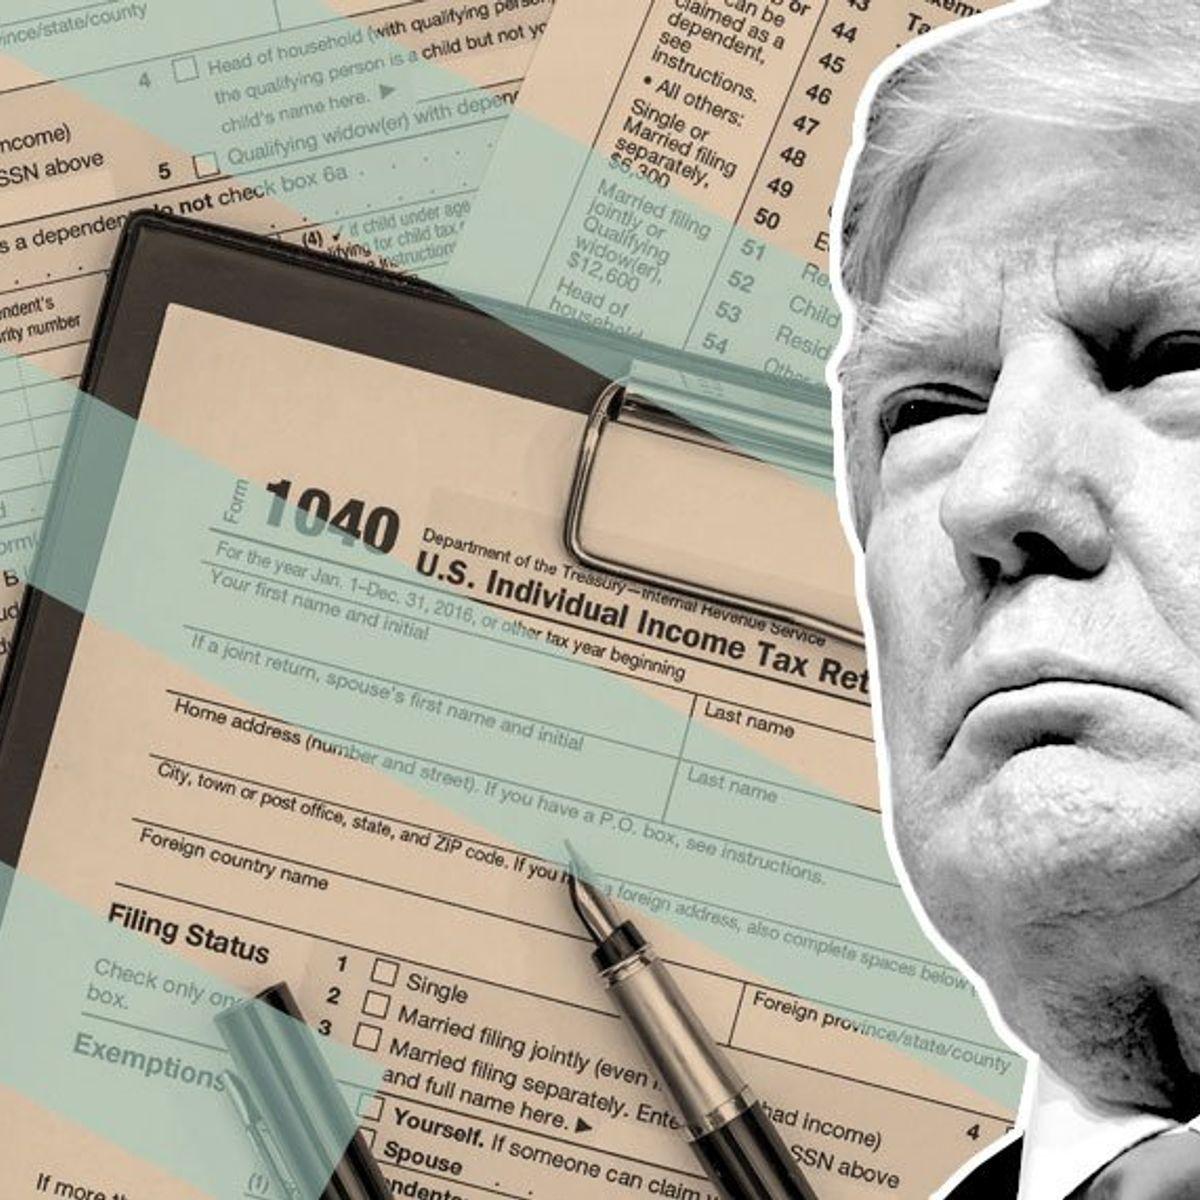 Manhattan district attorney subpoenas Trump's tax returns in probe of hush  money payments   Salon.com